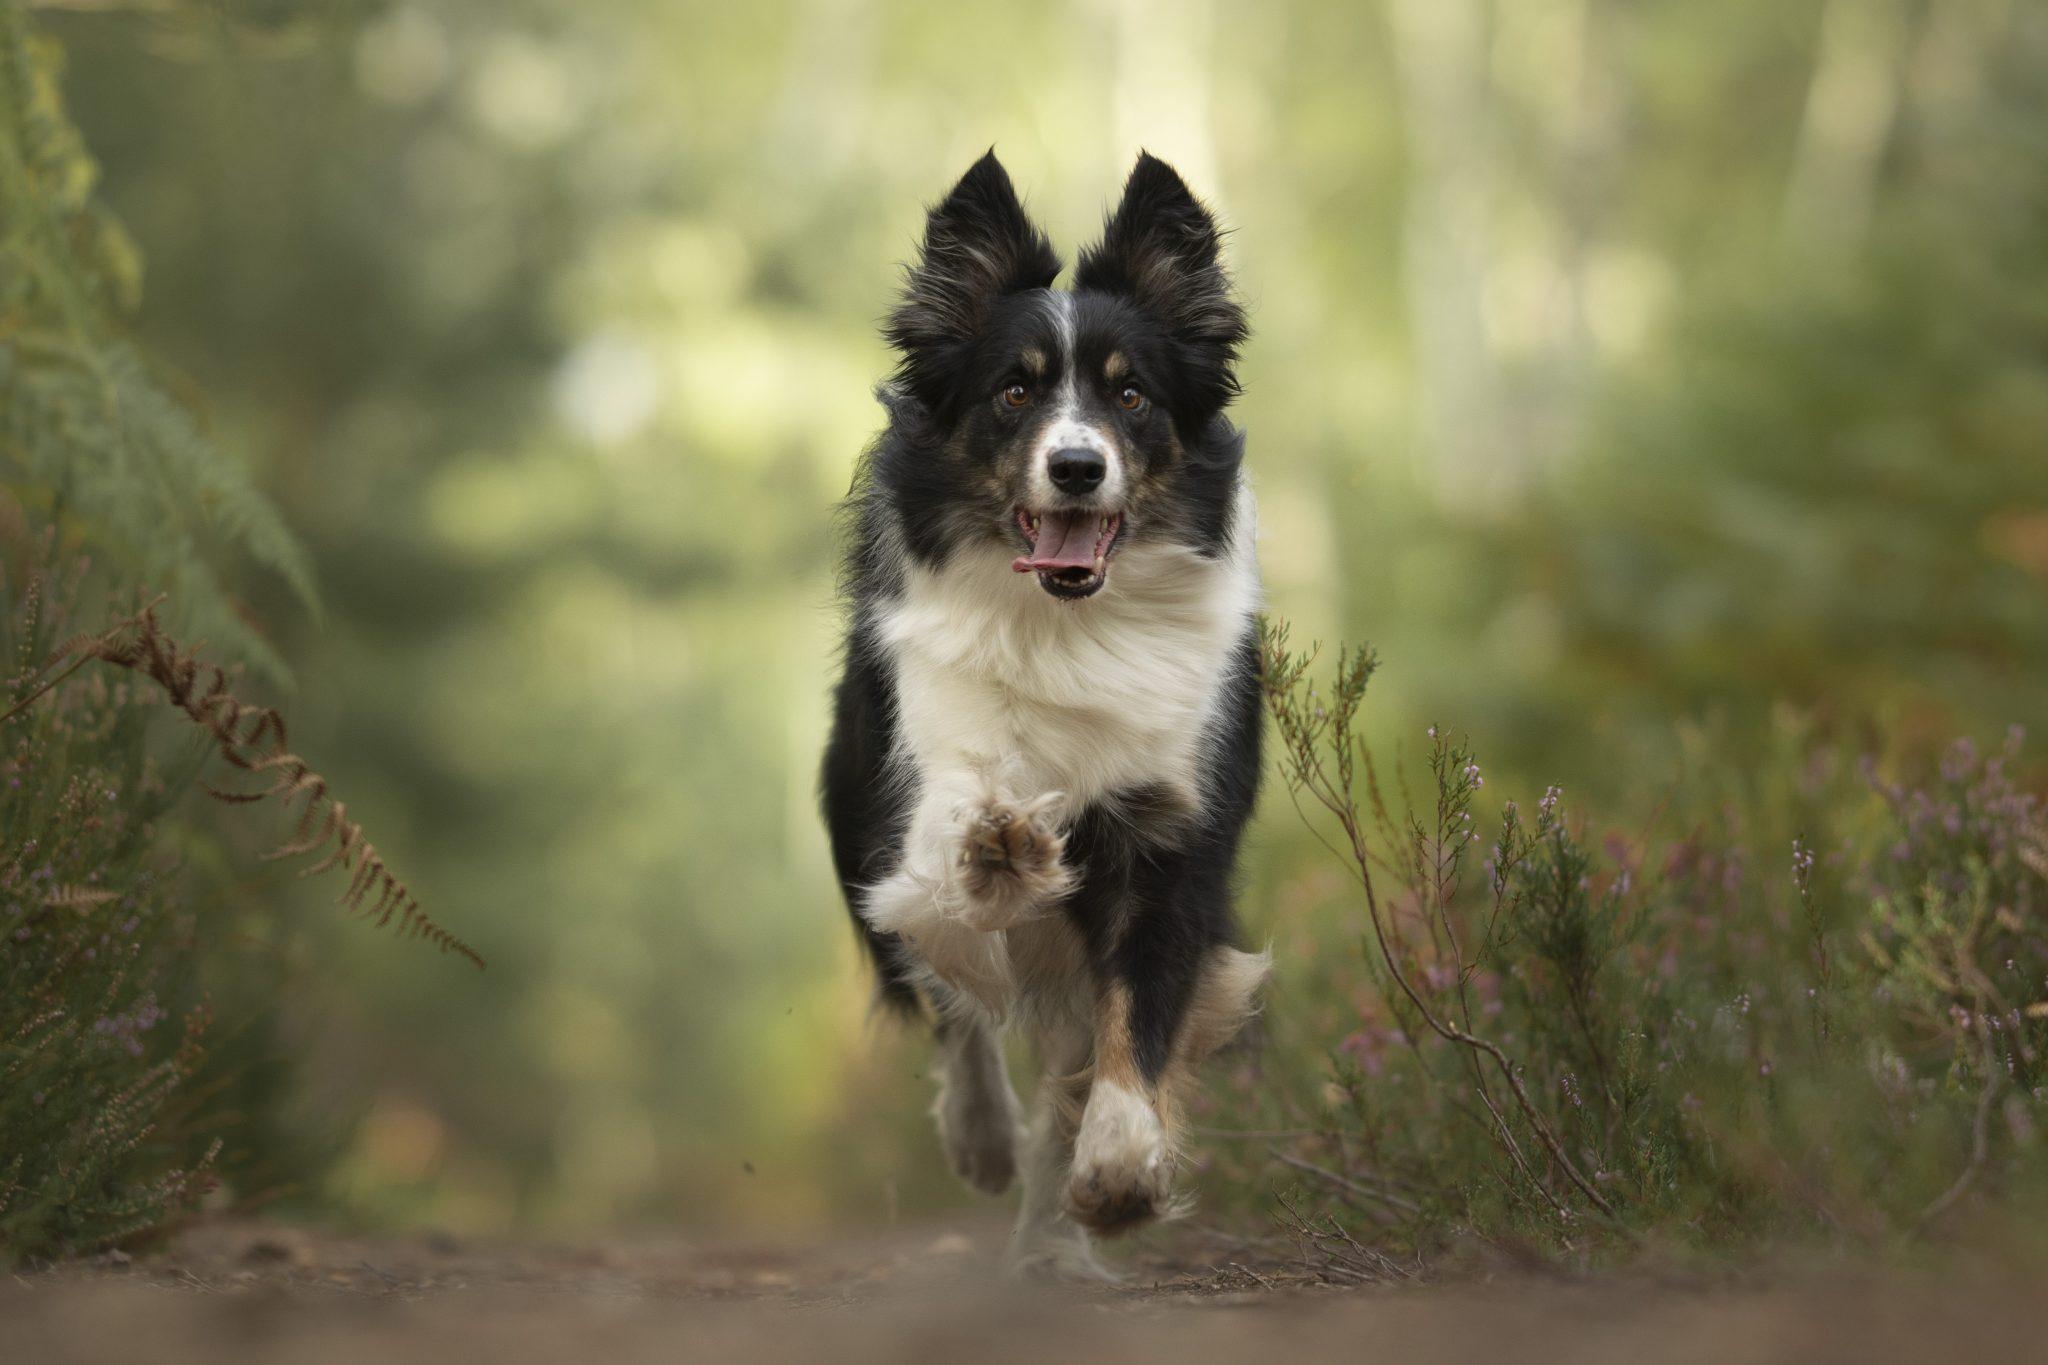 Chien course action photographe canin portrait cani look